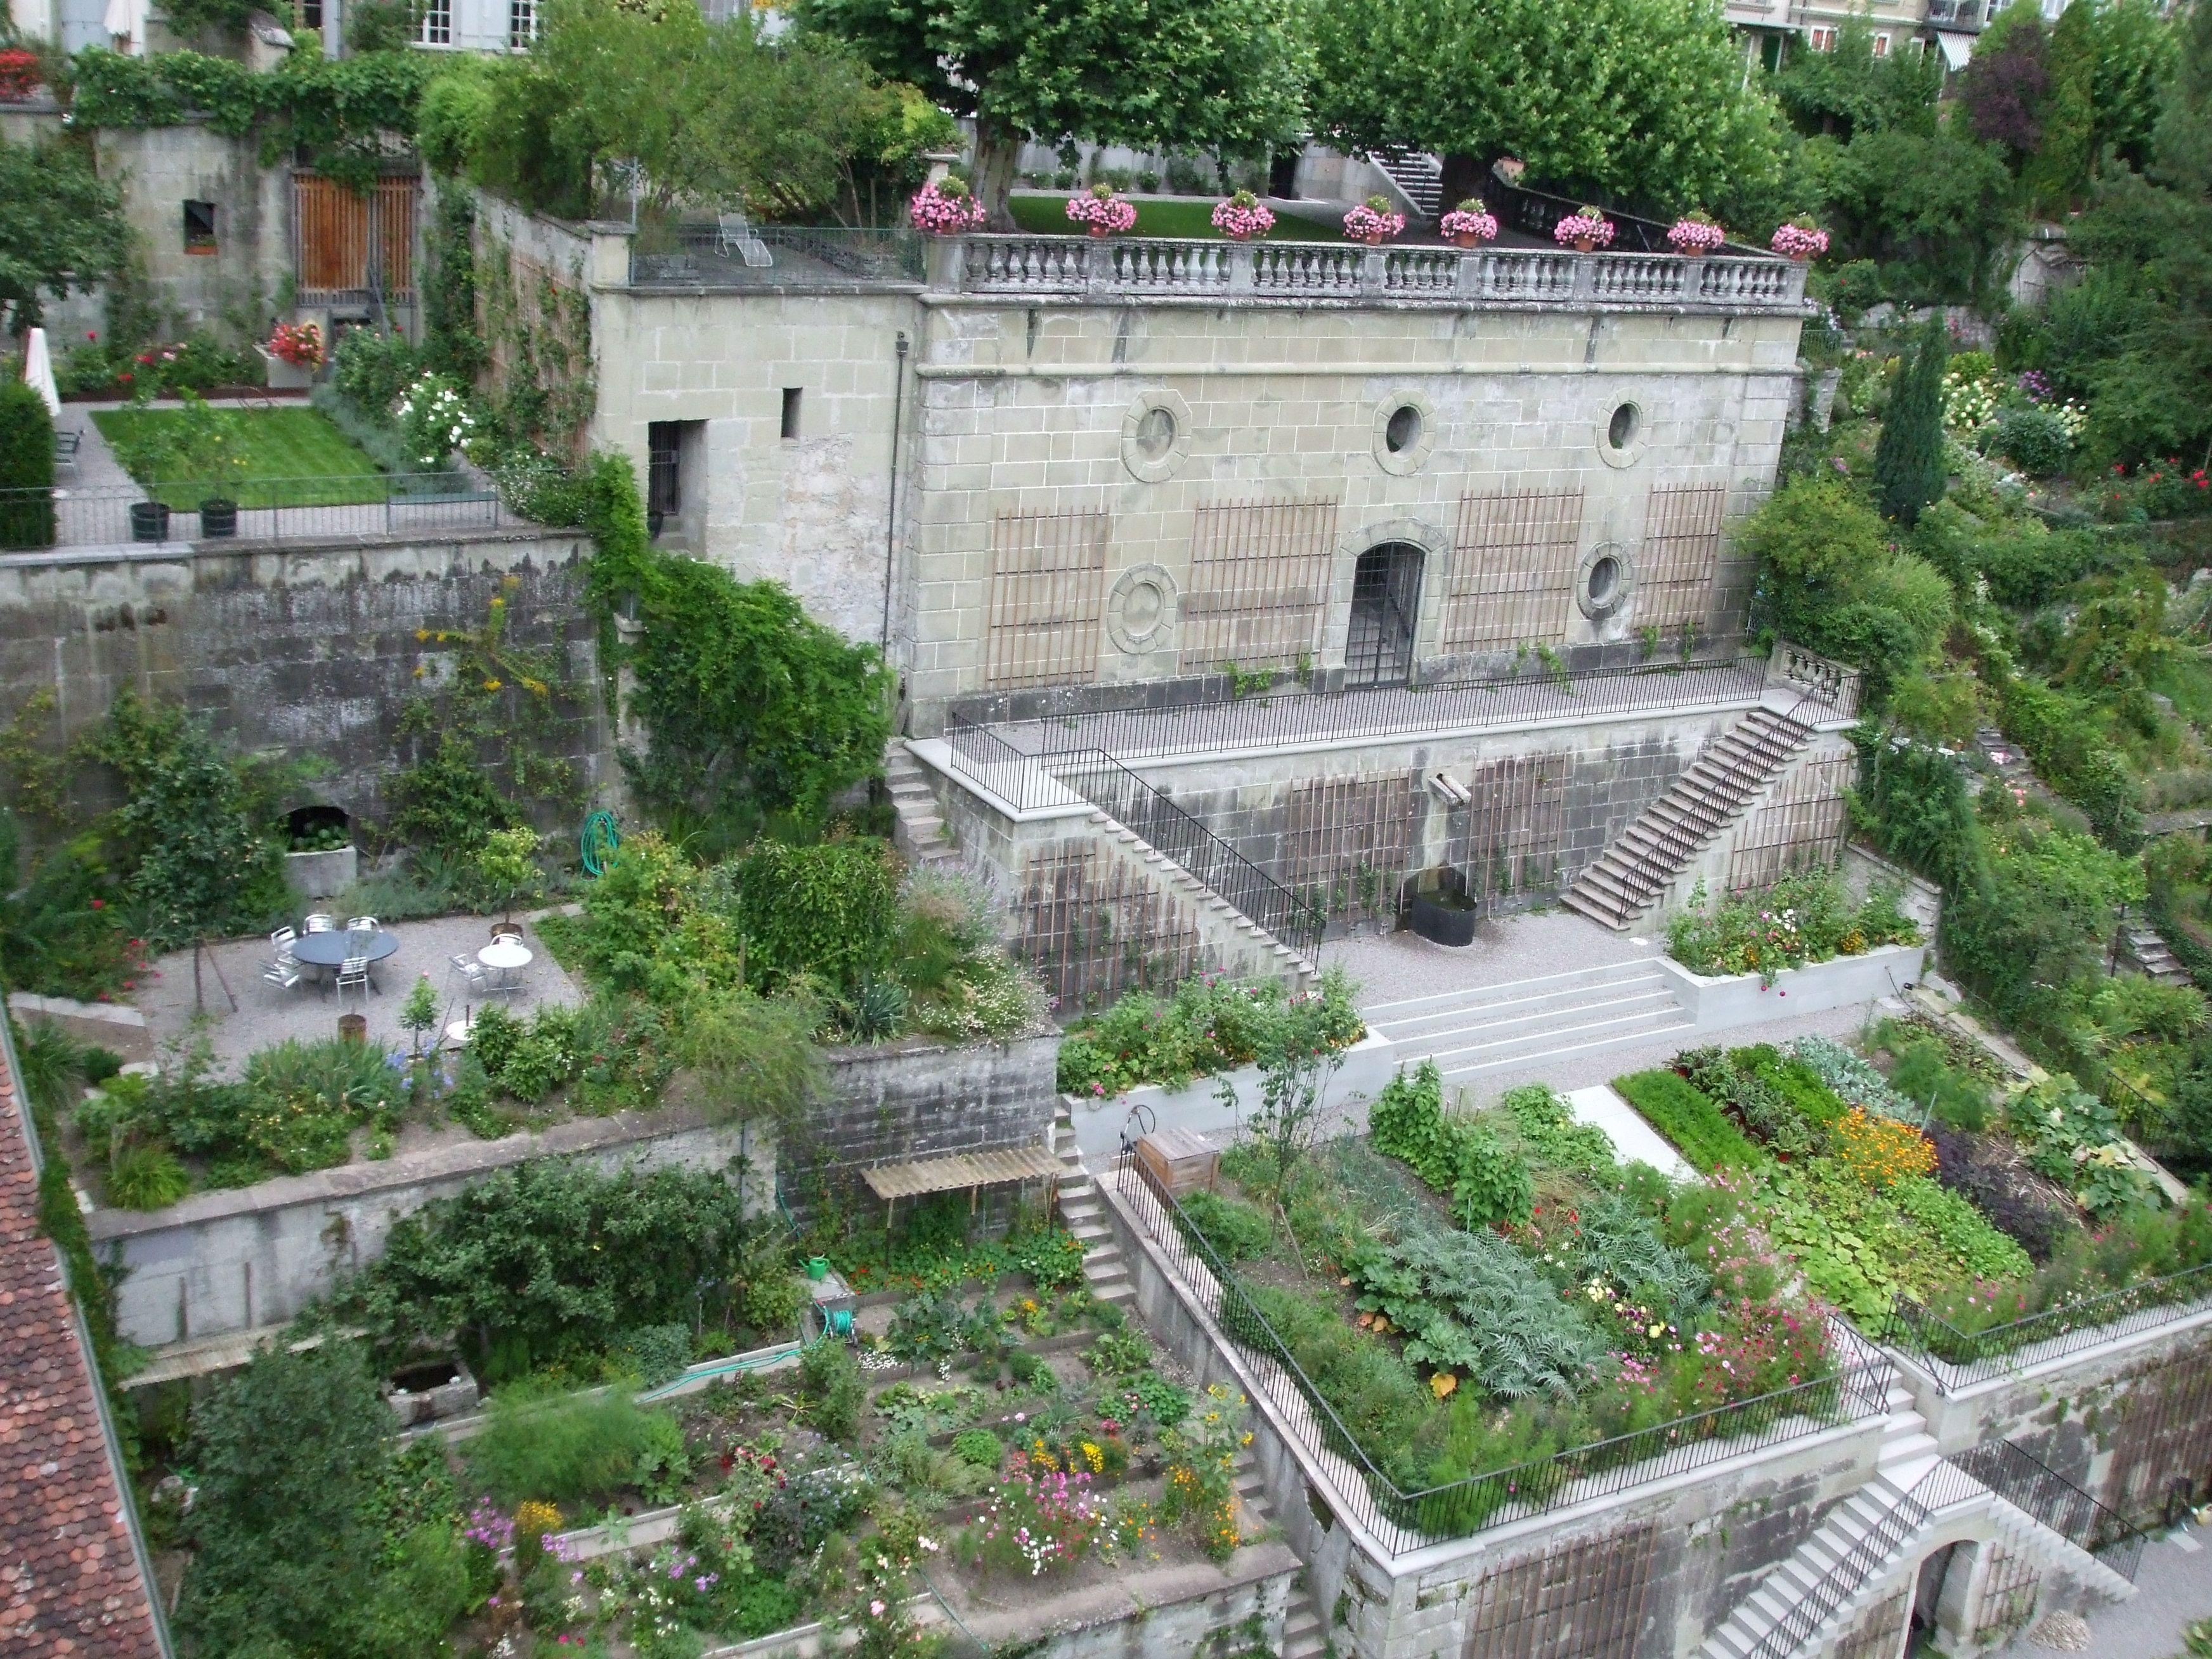 Uncategorized Terraced Gardens the terraced gardens of beatrice von wattenwyl haus bern switzerland